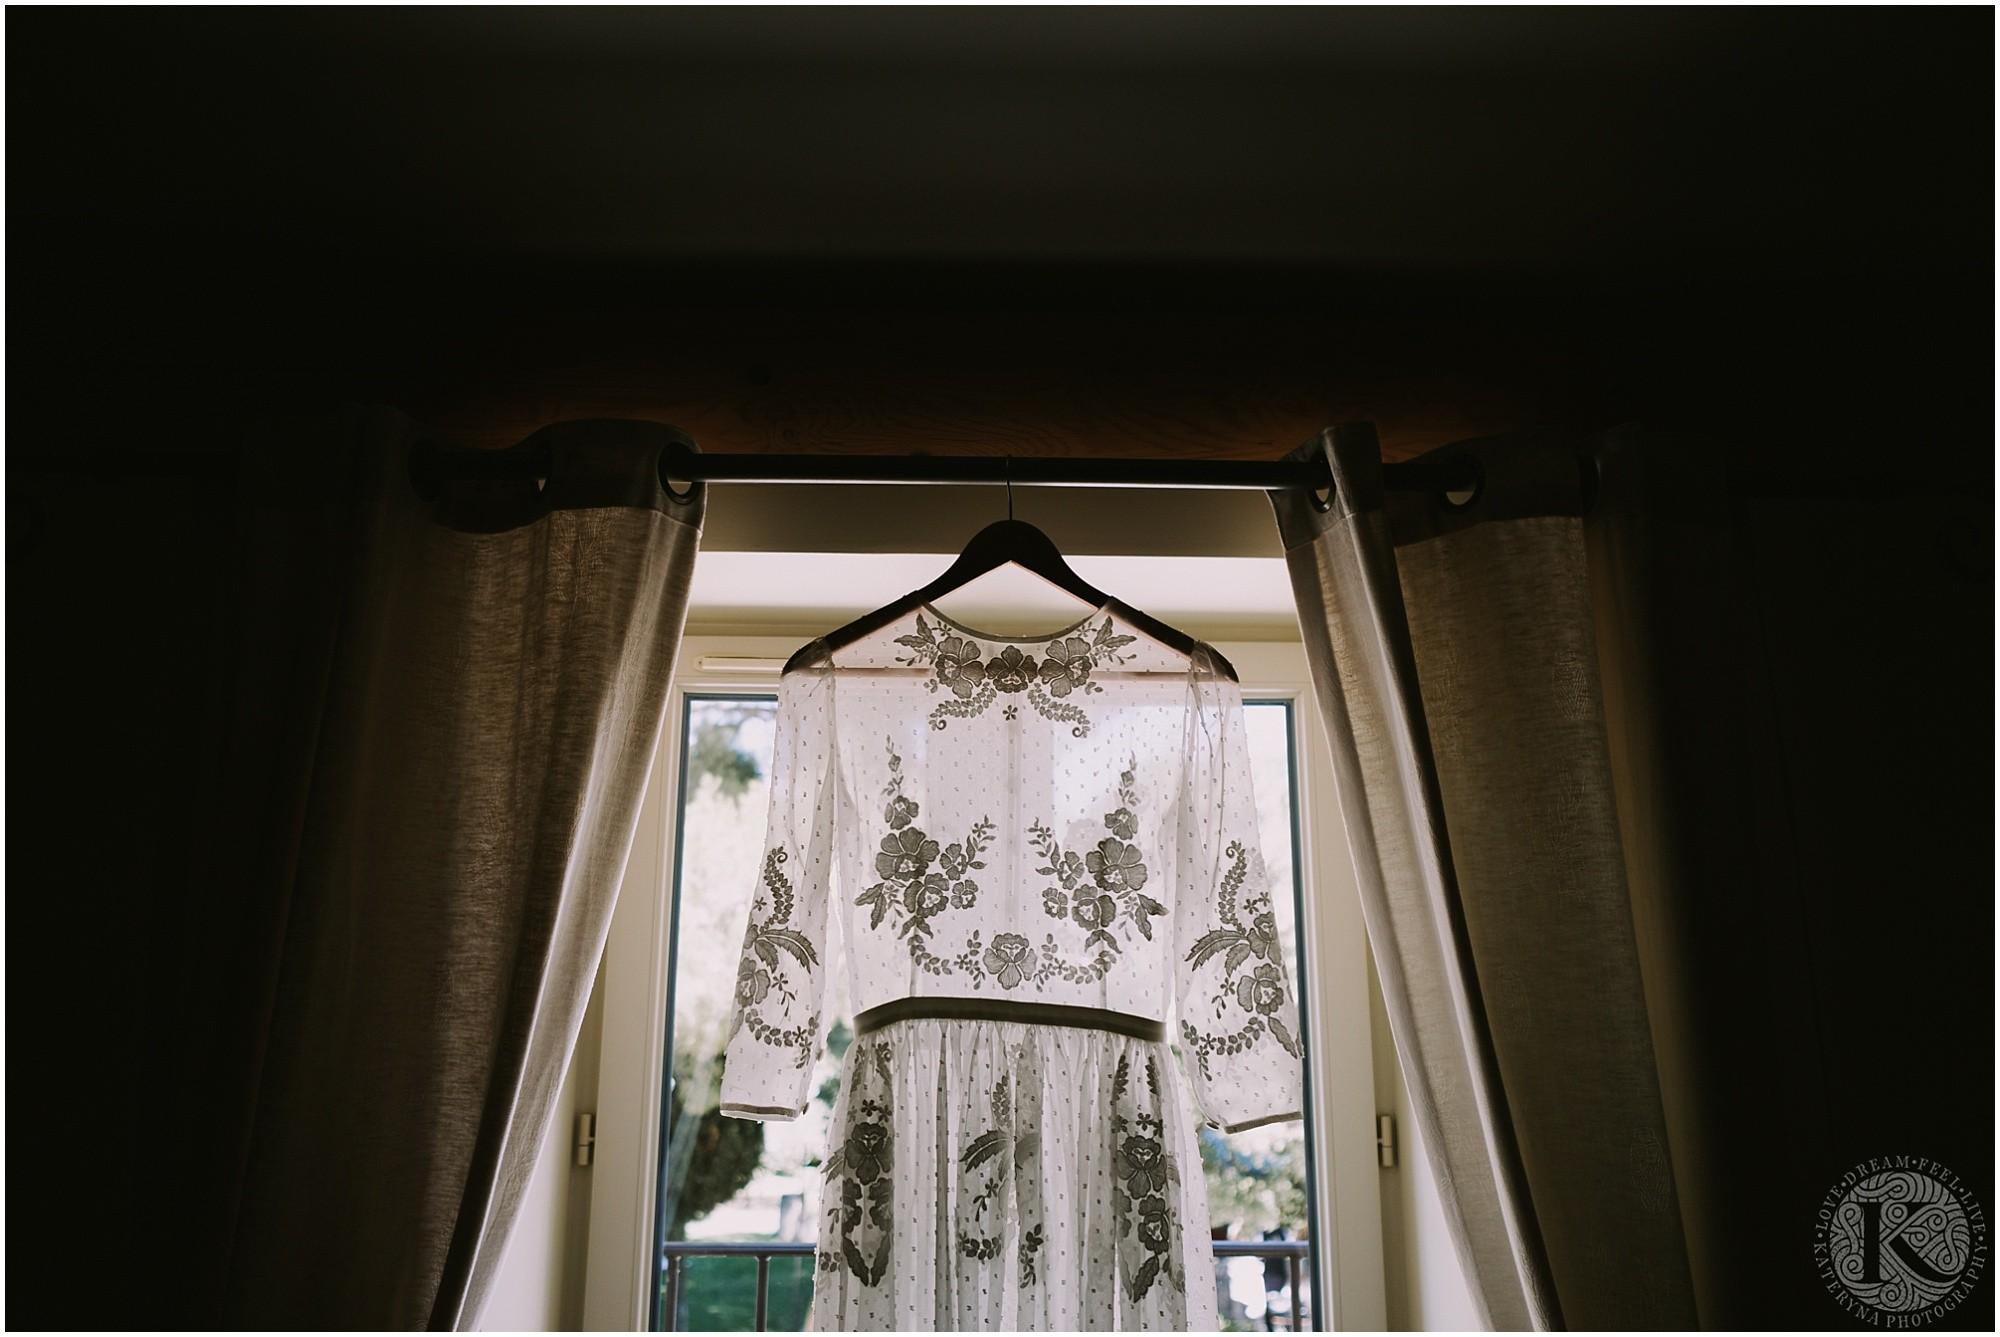 Kateryna-photos-photographe-mariage-vaucluse-provence-avignon-ferme-st-hugues_0012.jpg